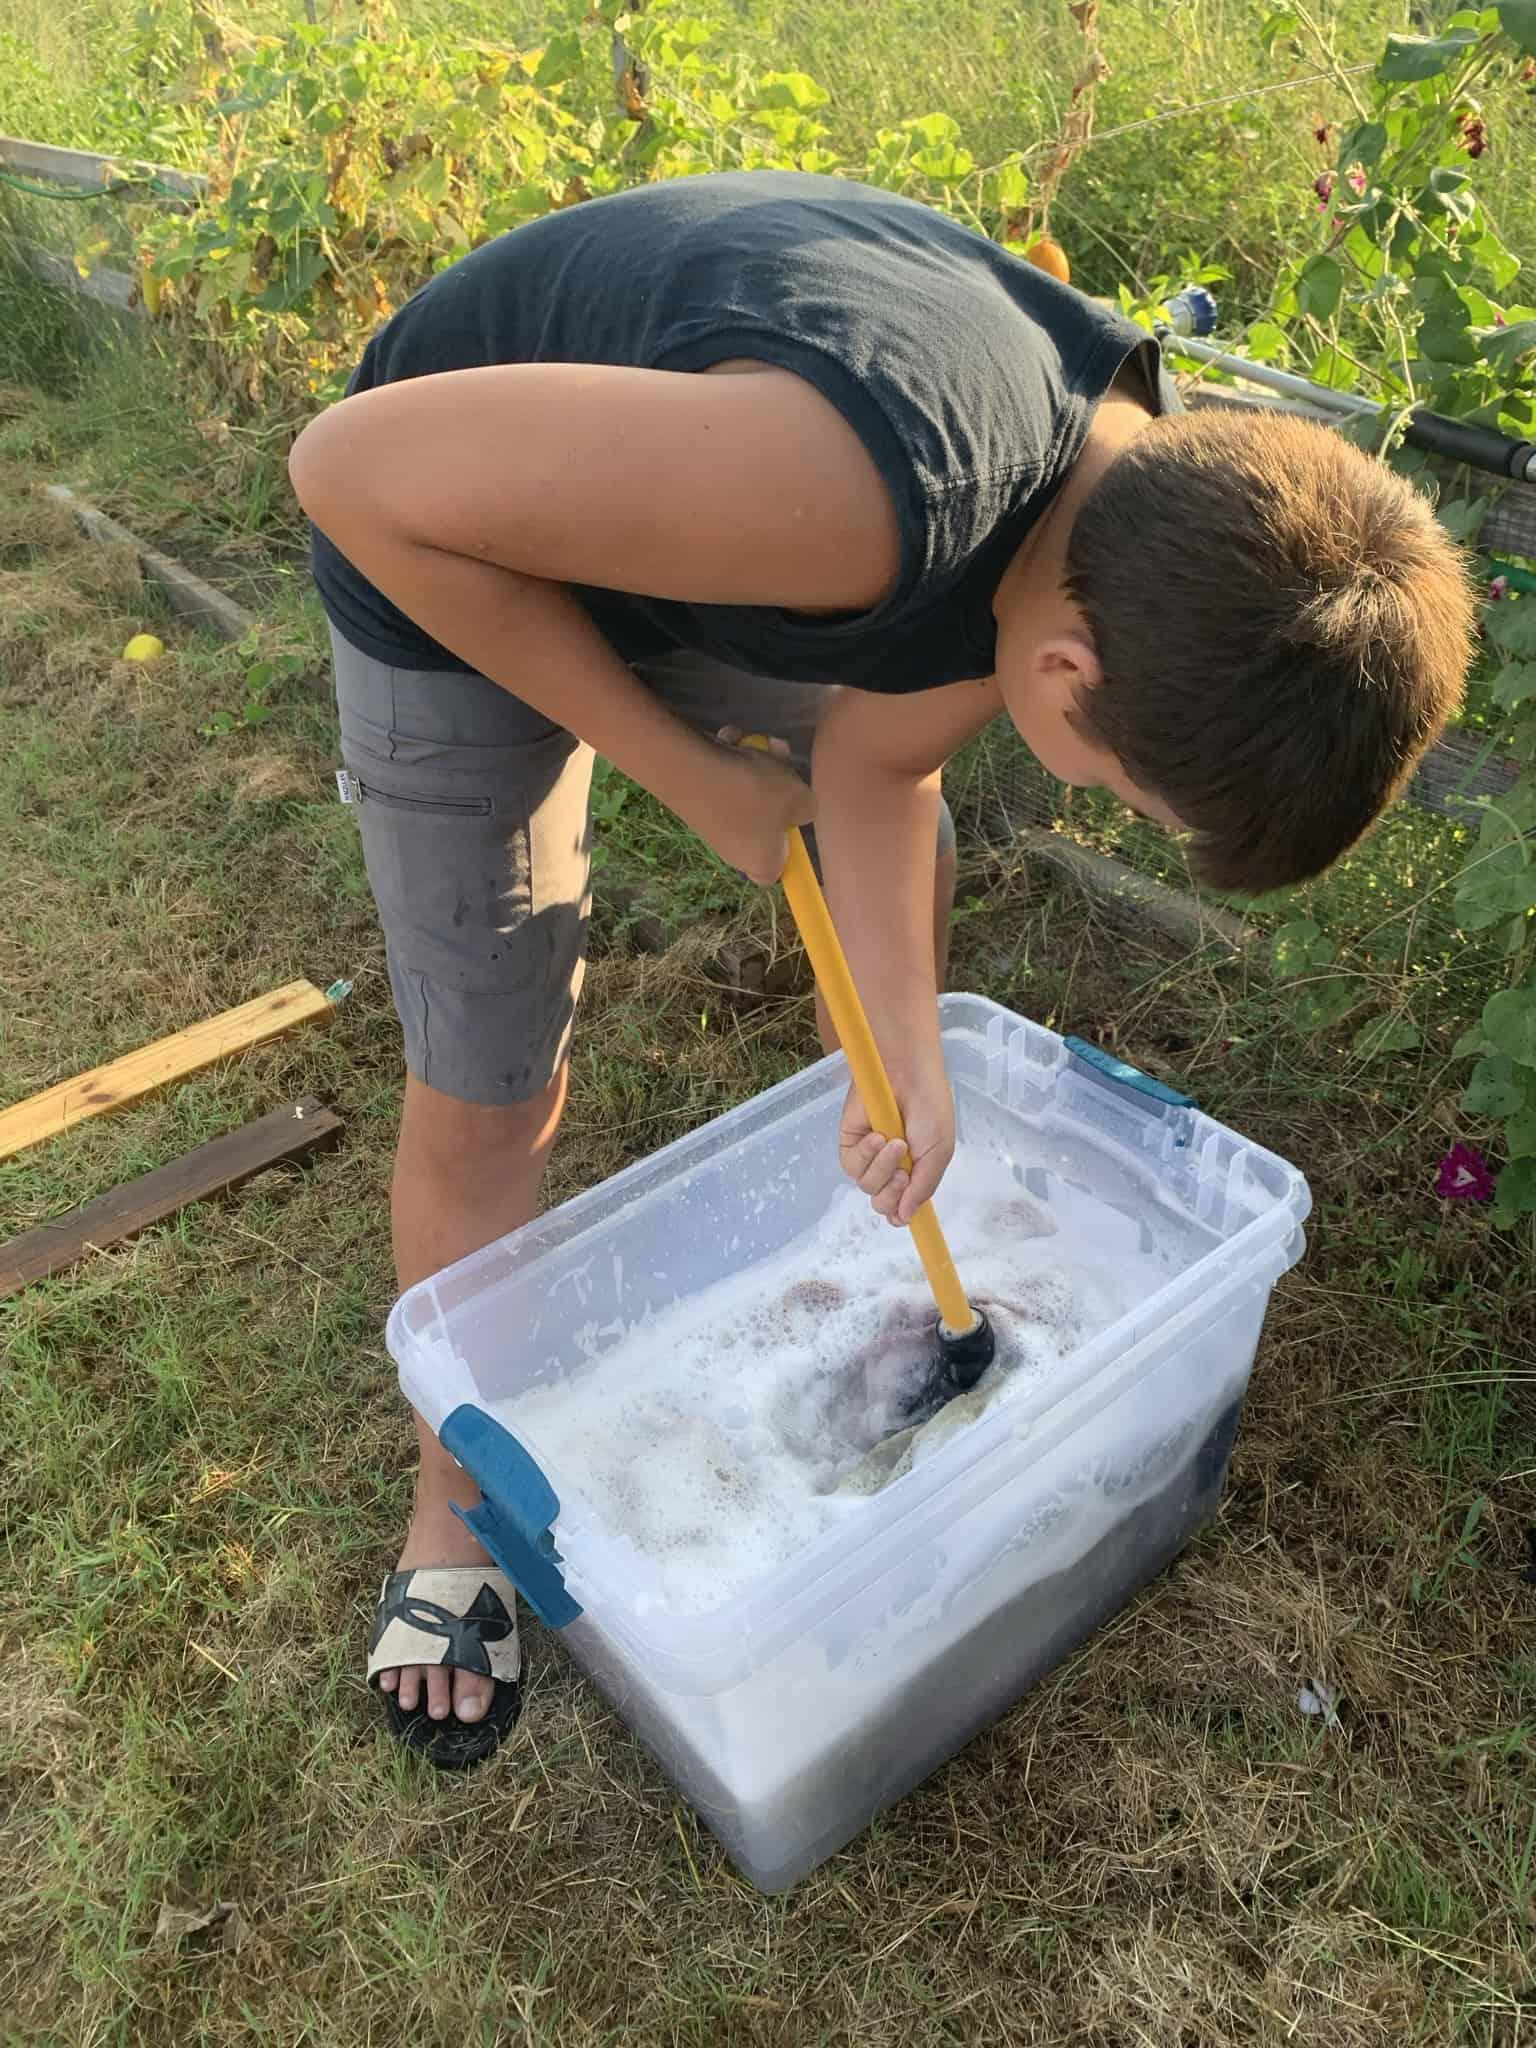 Hand Washing Laundry – 1 Powerful Skill